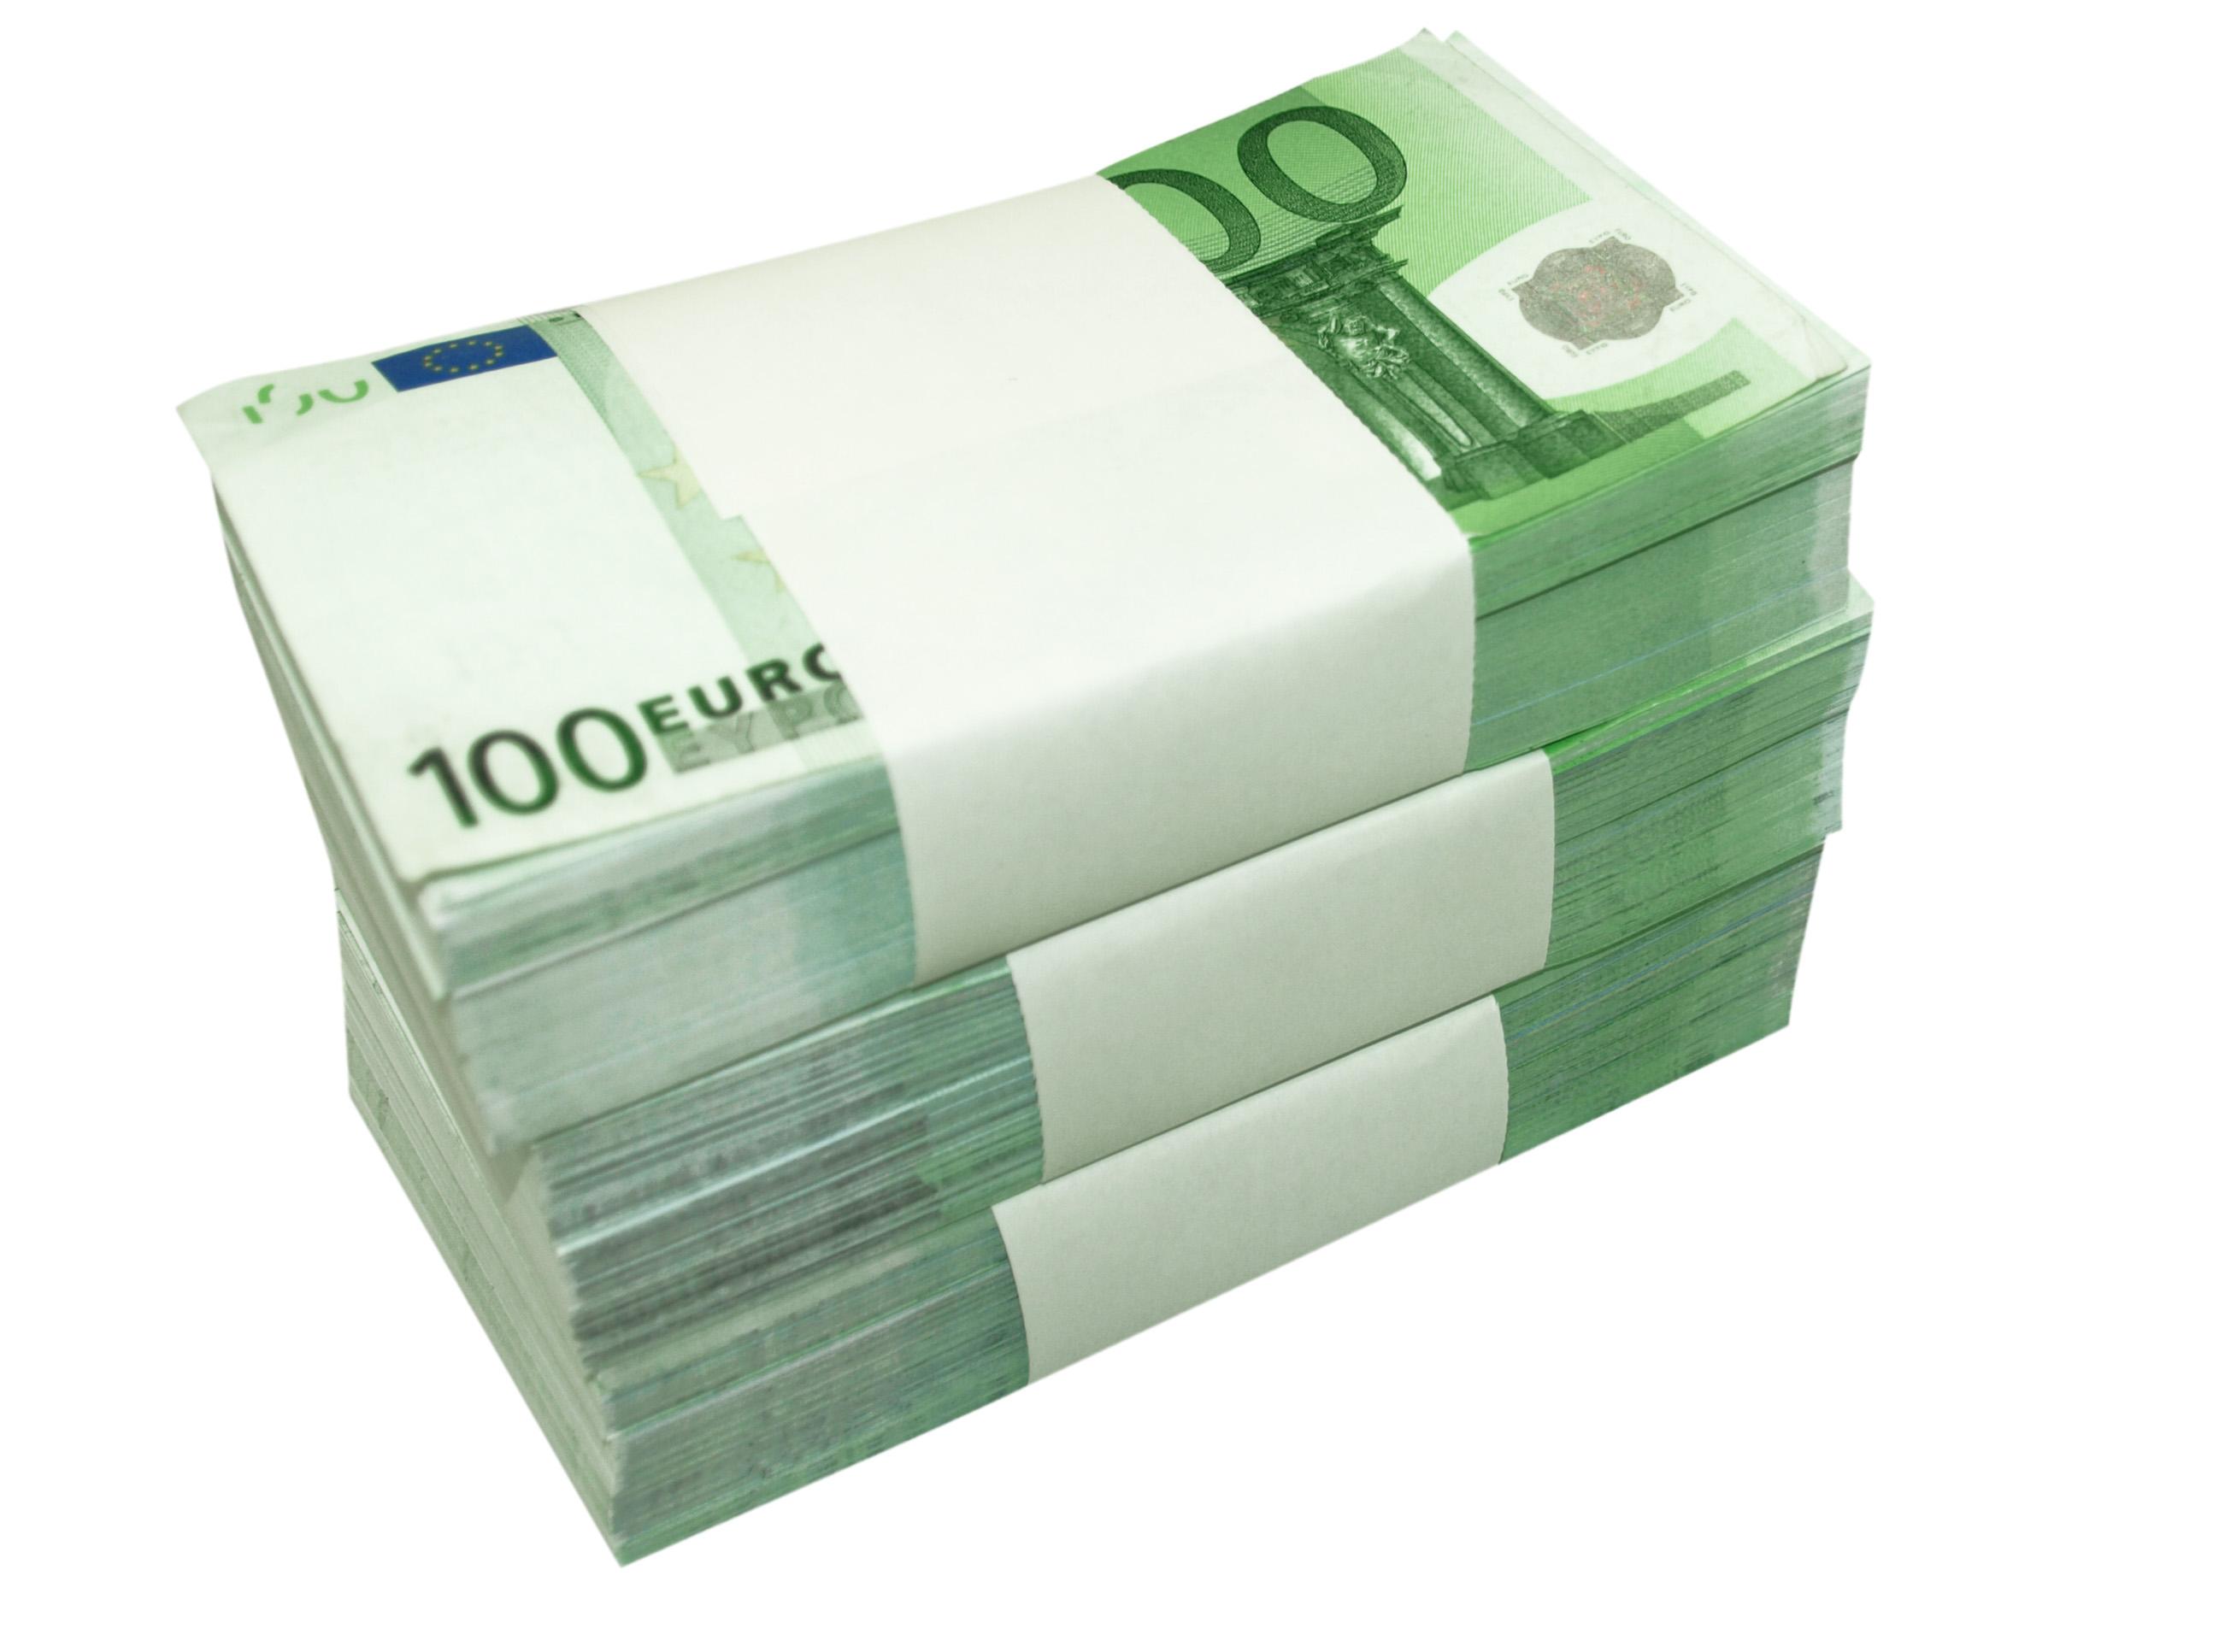 Optimistic news for Slovenian economy